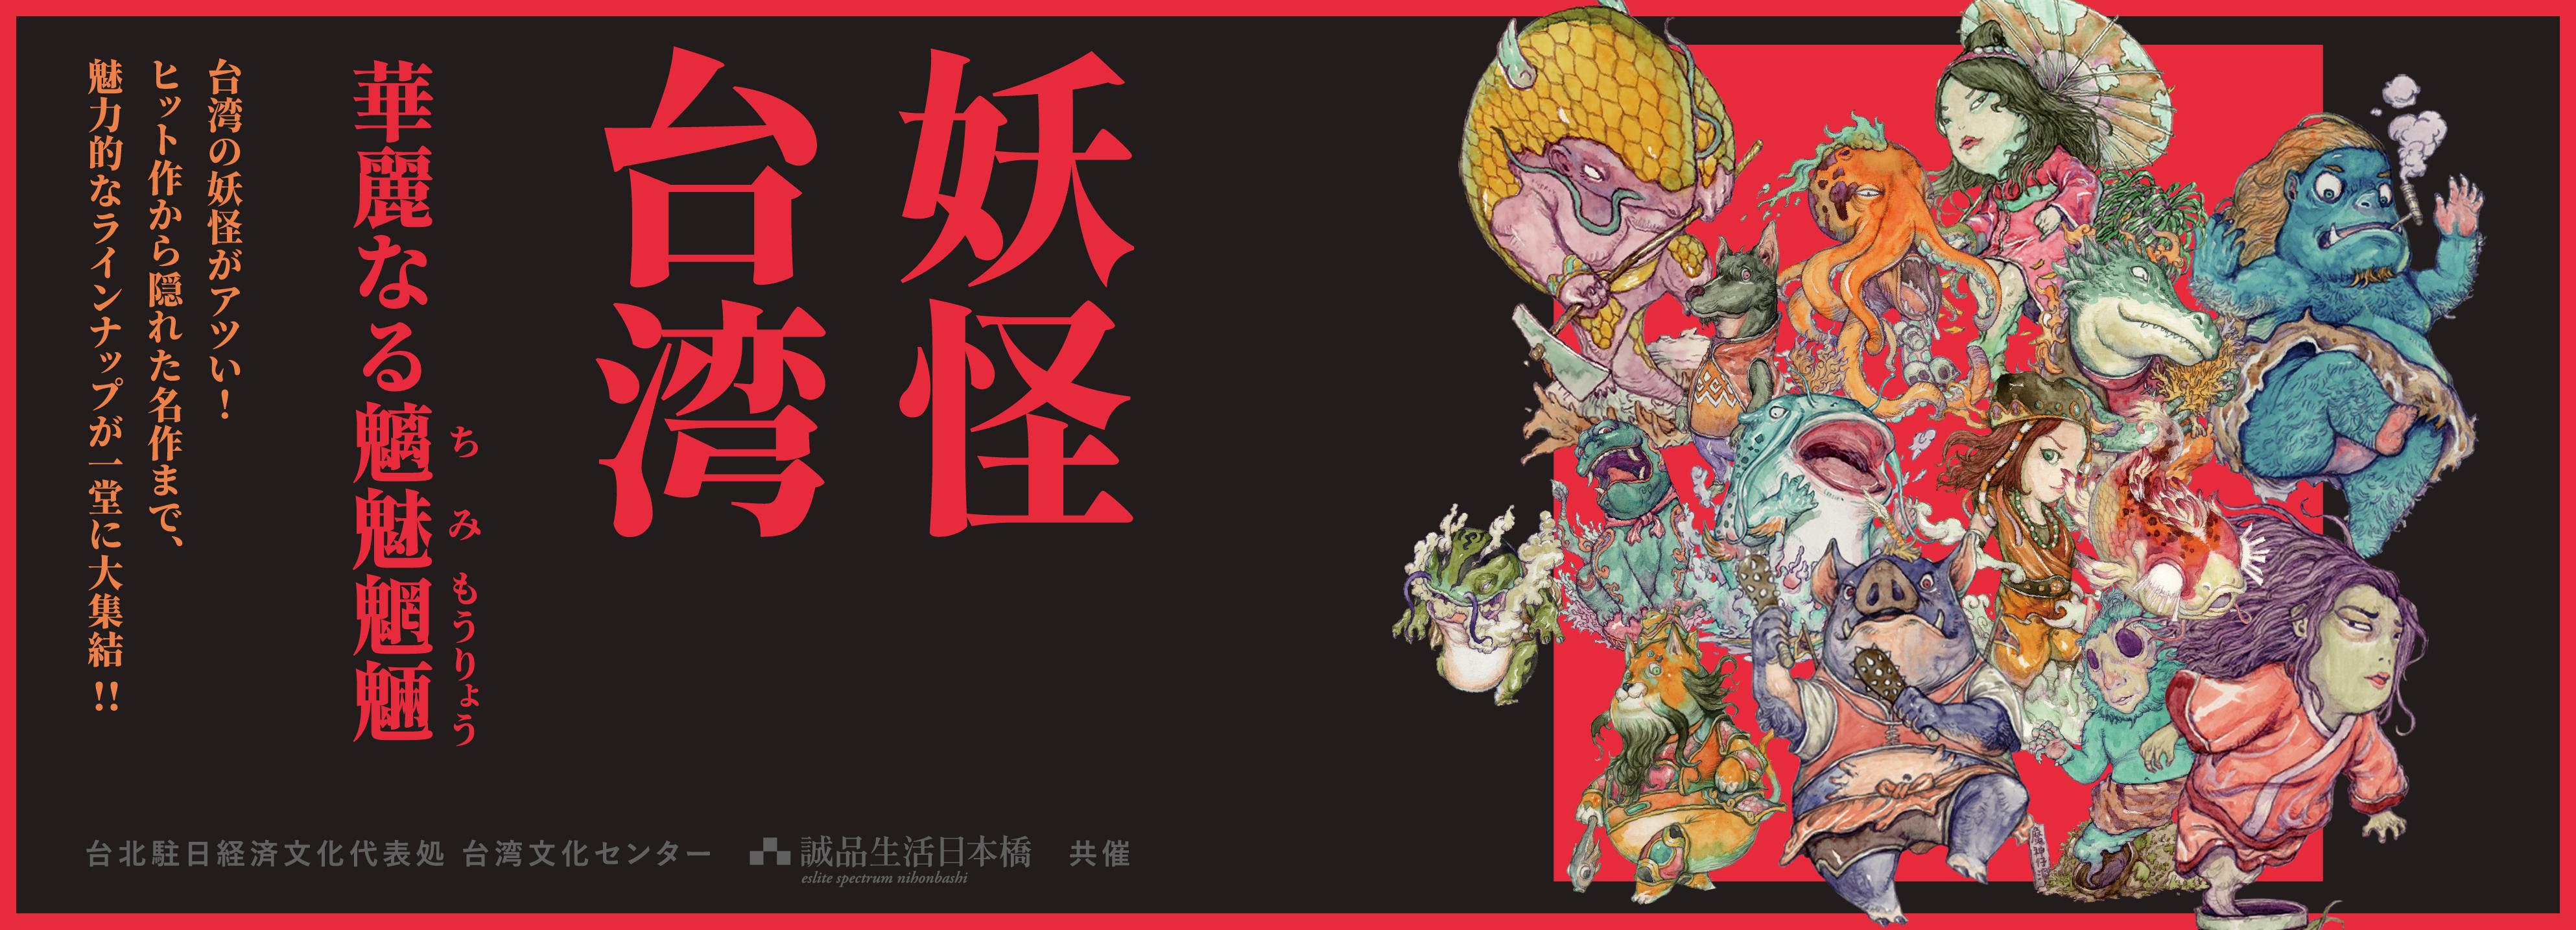 妖怪台湾 ──華麗なる魑魅魍魎